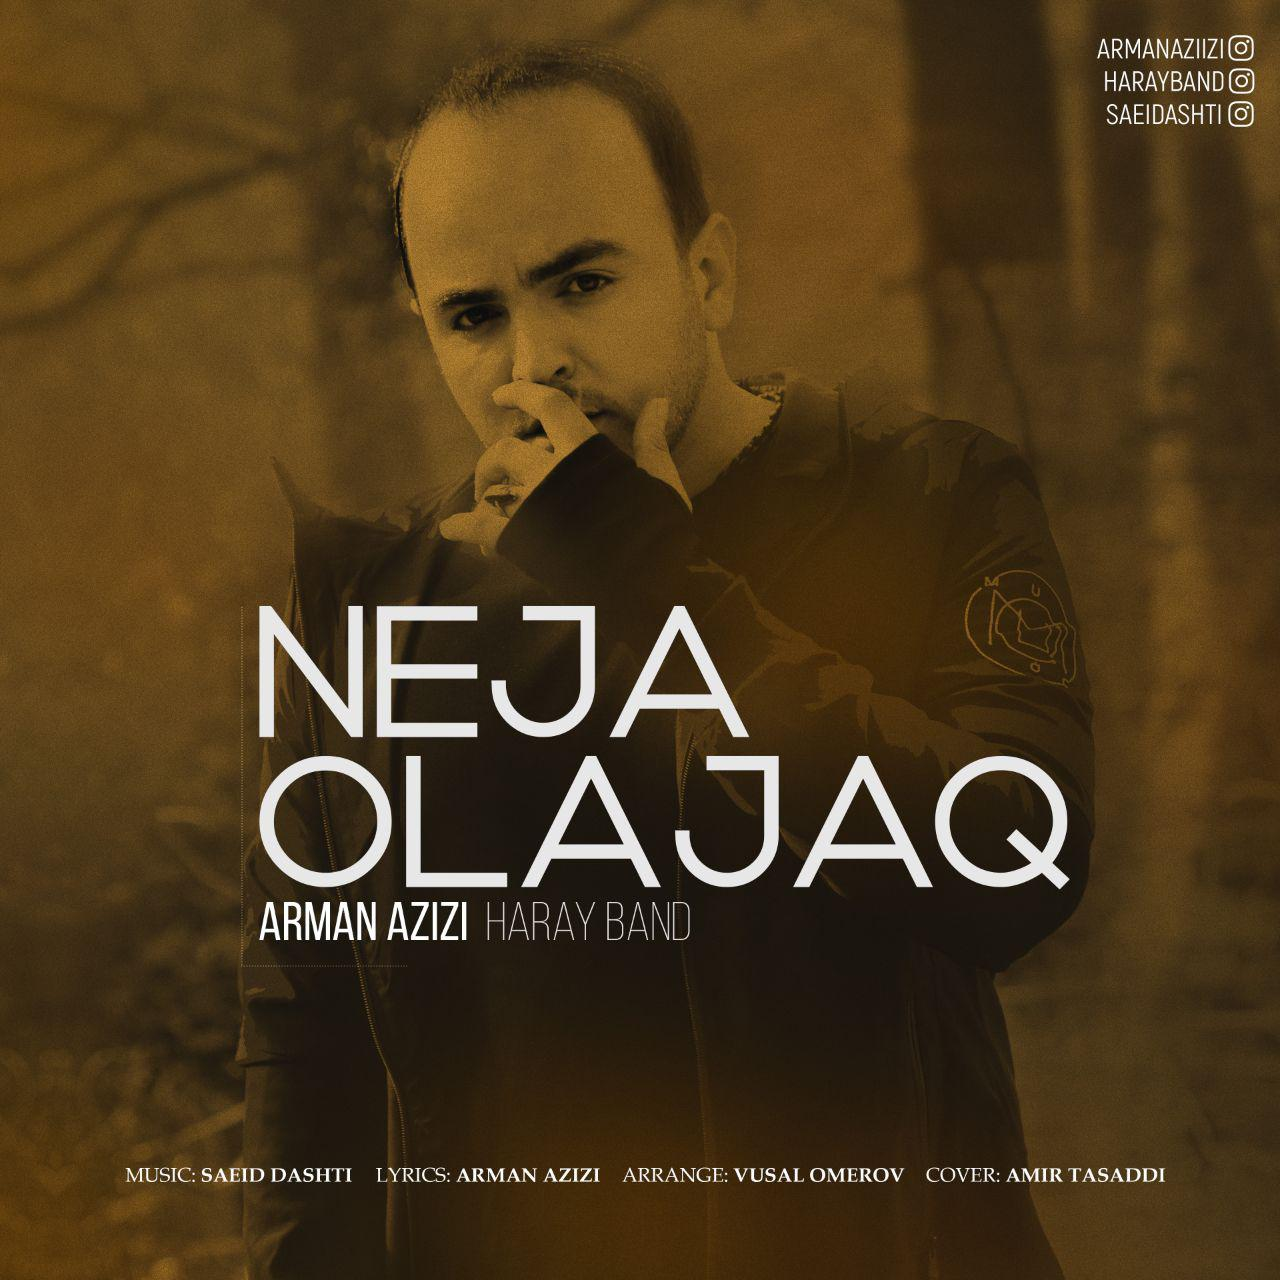 http://s9.picofile.com/file/8310689550/08Haray_Band_Neja_Olajaq.jpg